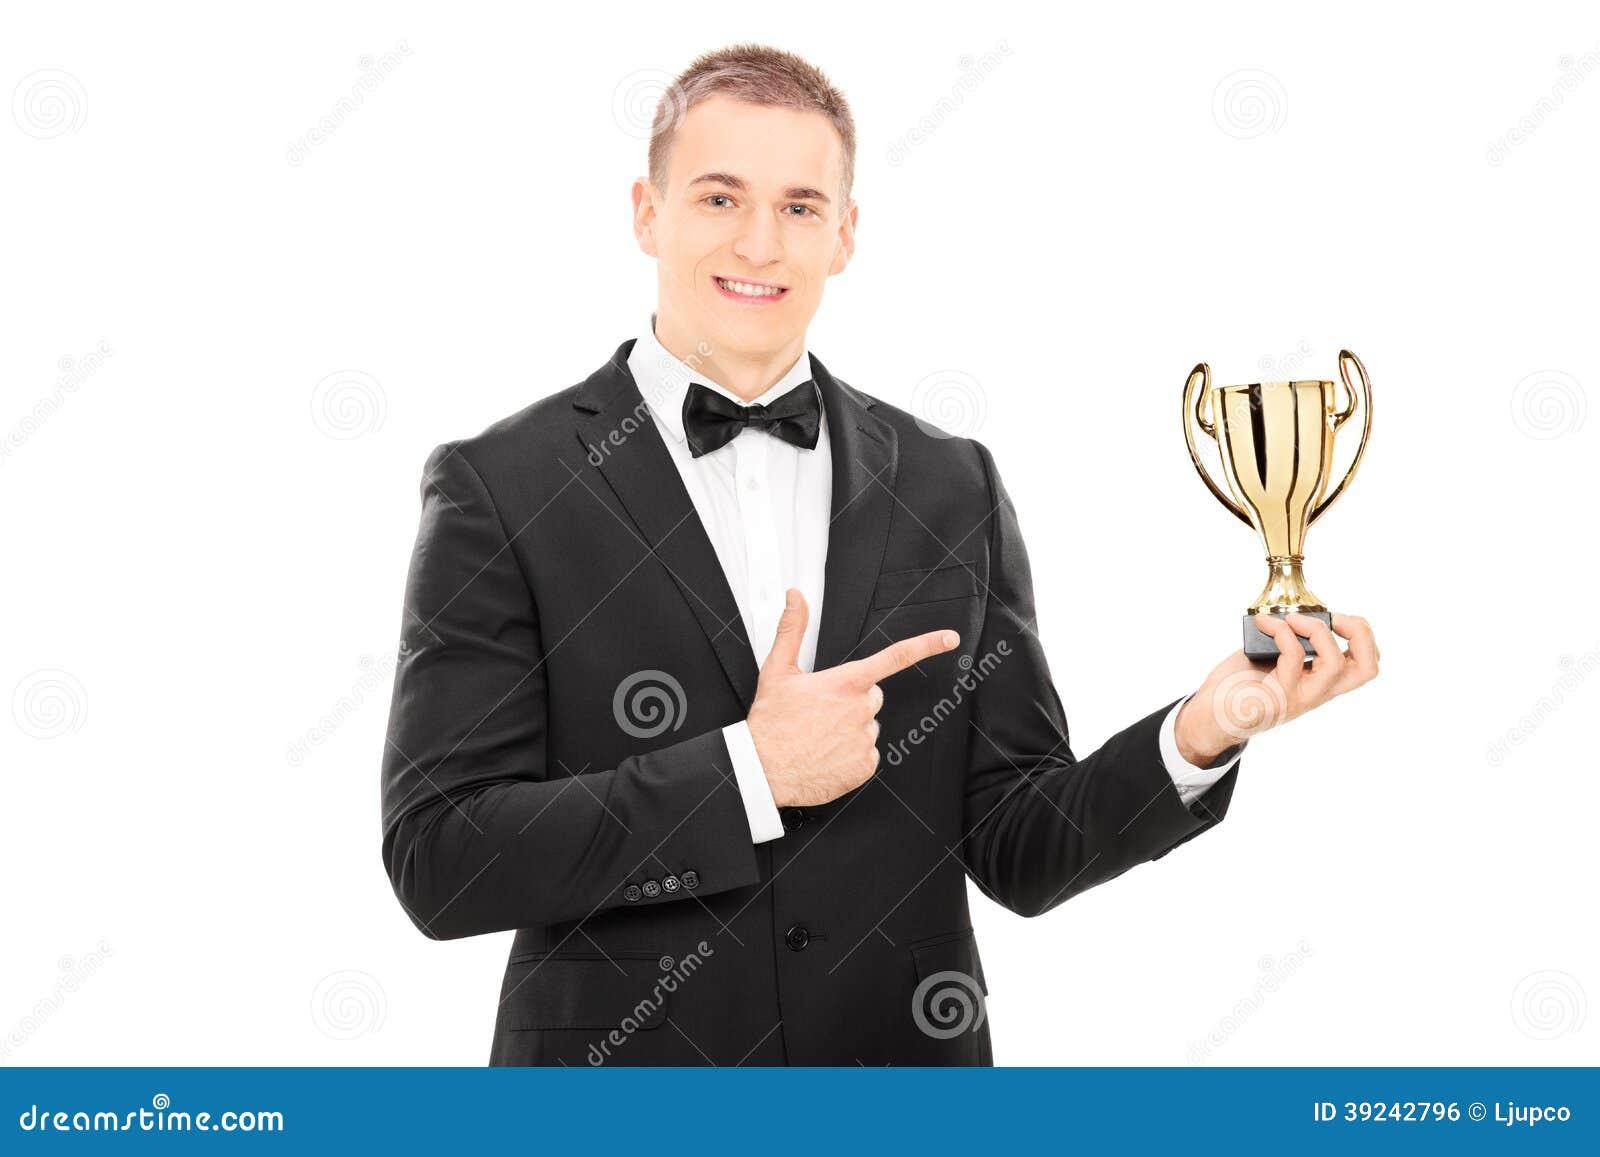 Elegant man holding a trophy